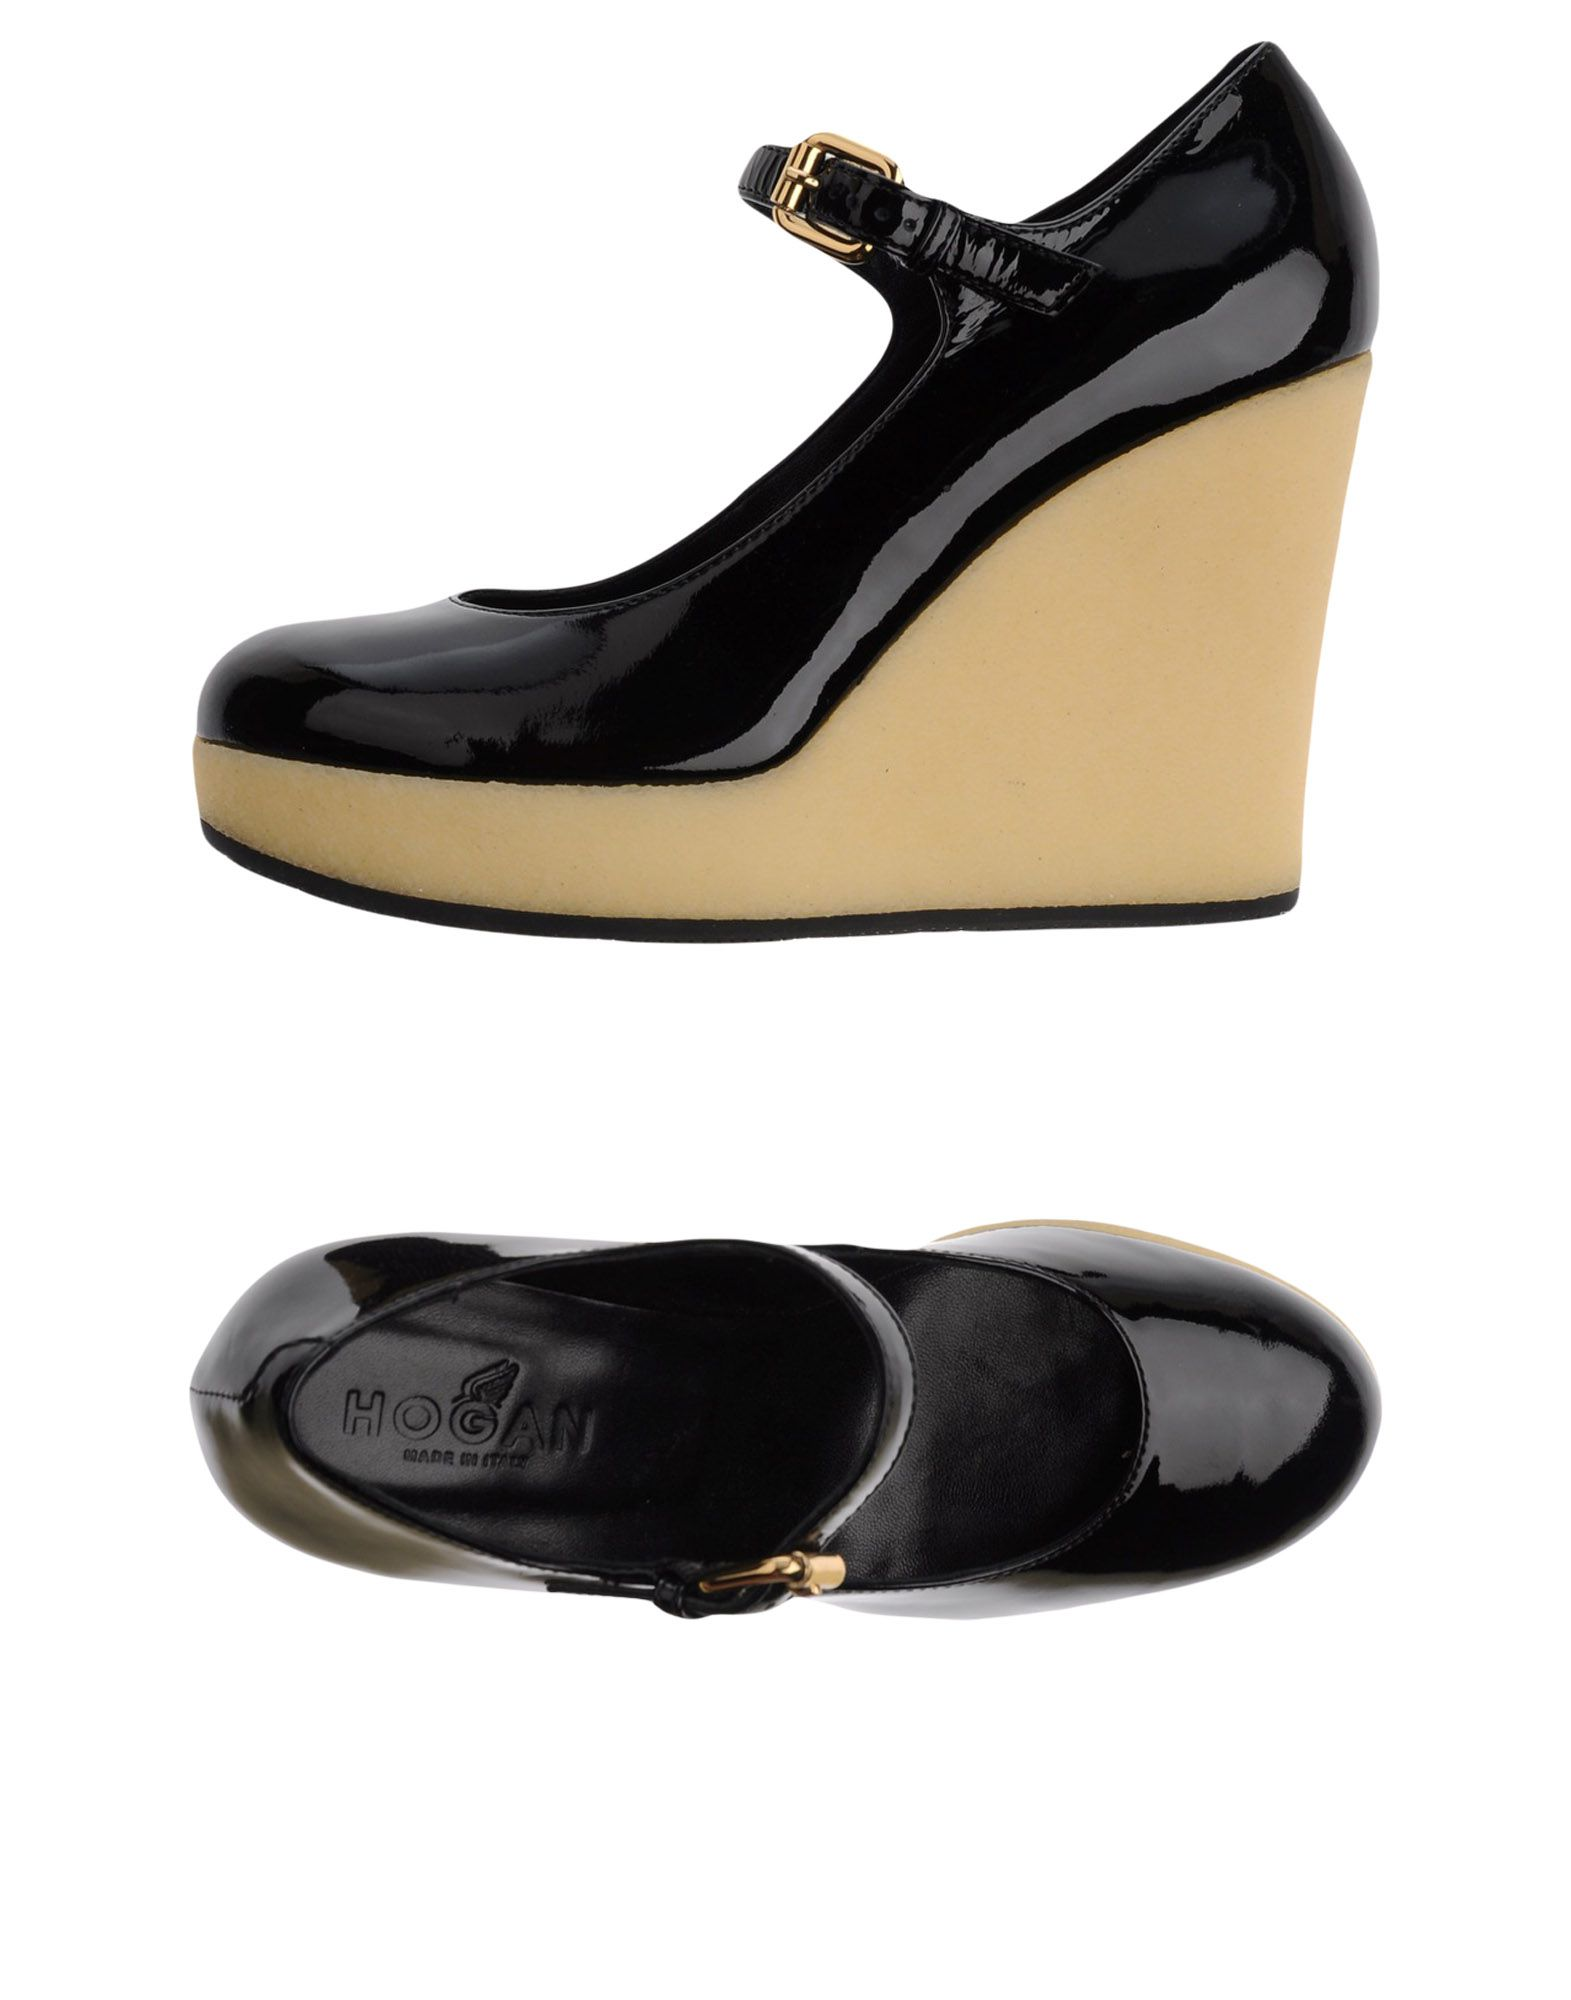 Stilvolle billige Schuhe Hogan Pumps Damen  11240503HB